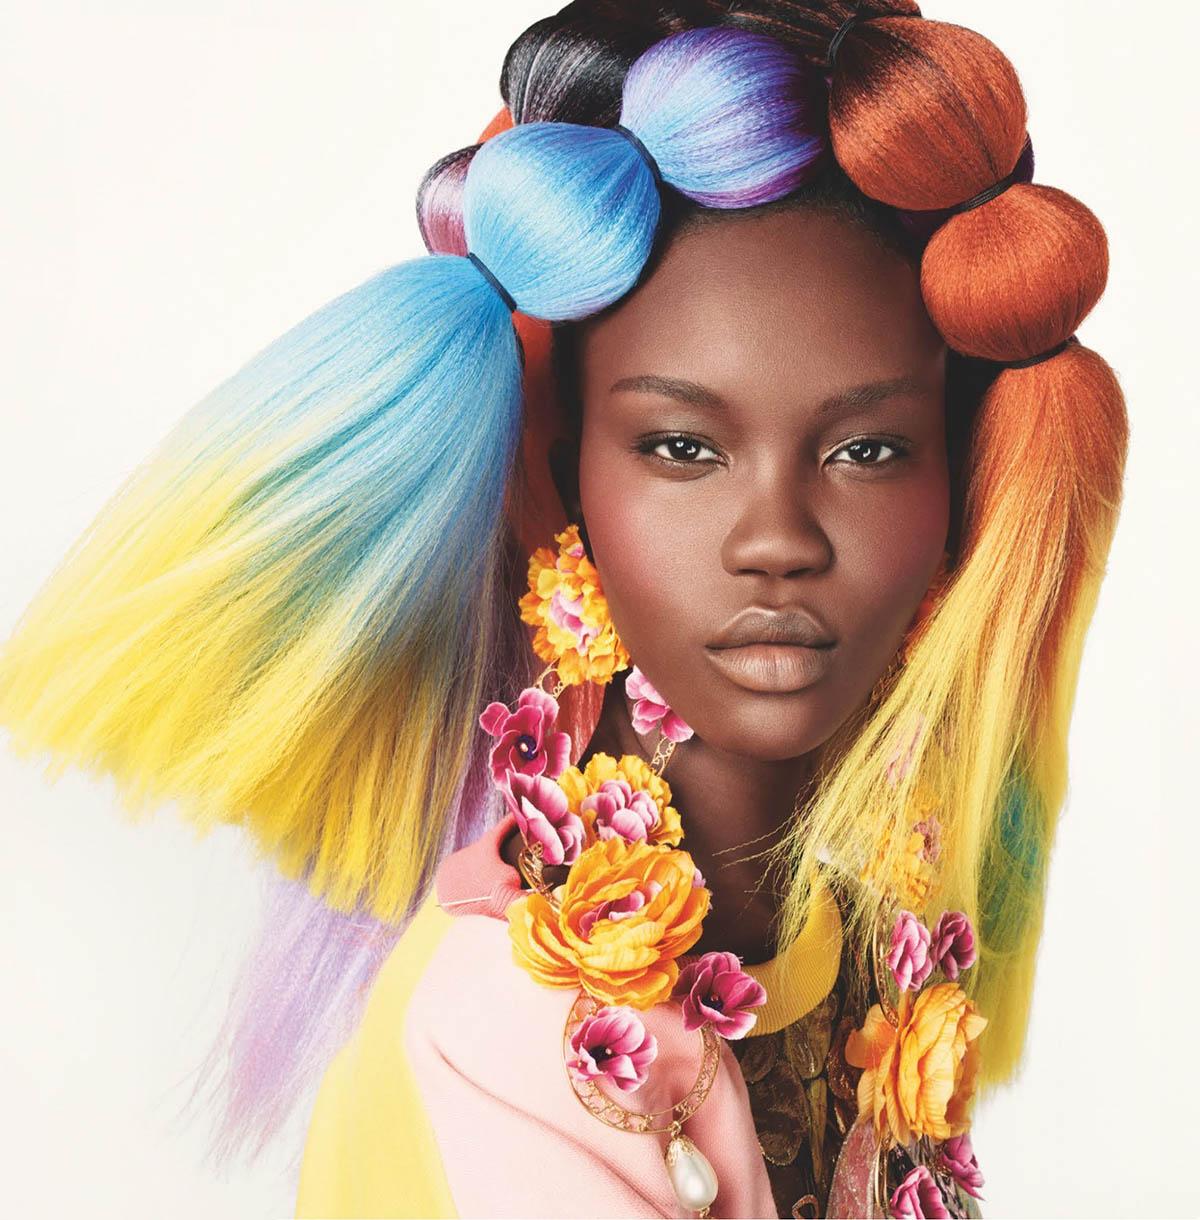 British Vogue April 2021 covers by Steven Meisel